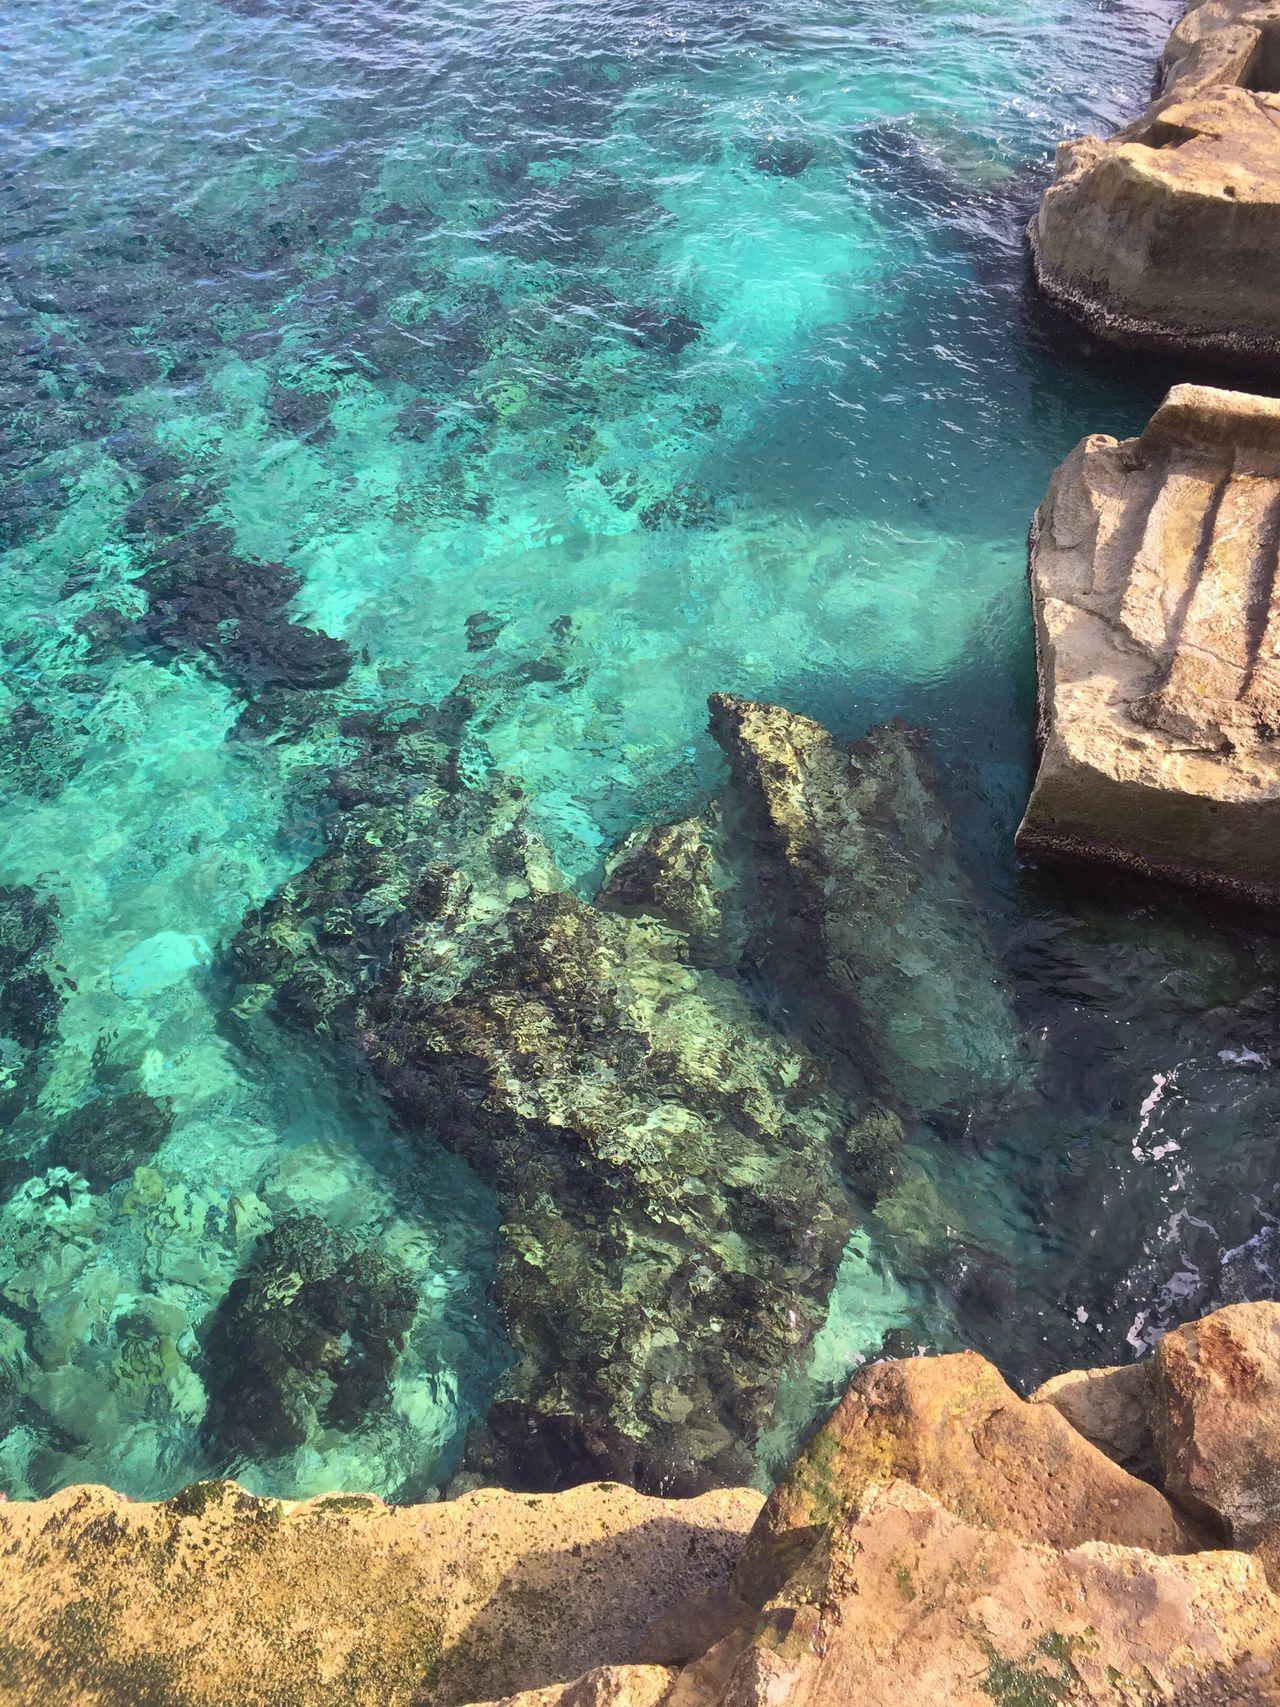 Malta Crystal Clear Waters Rocks Island Life